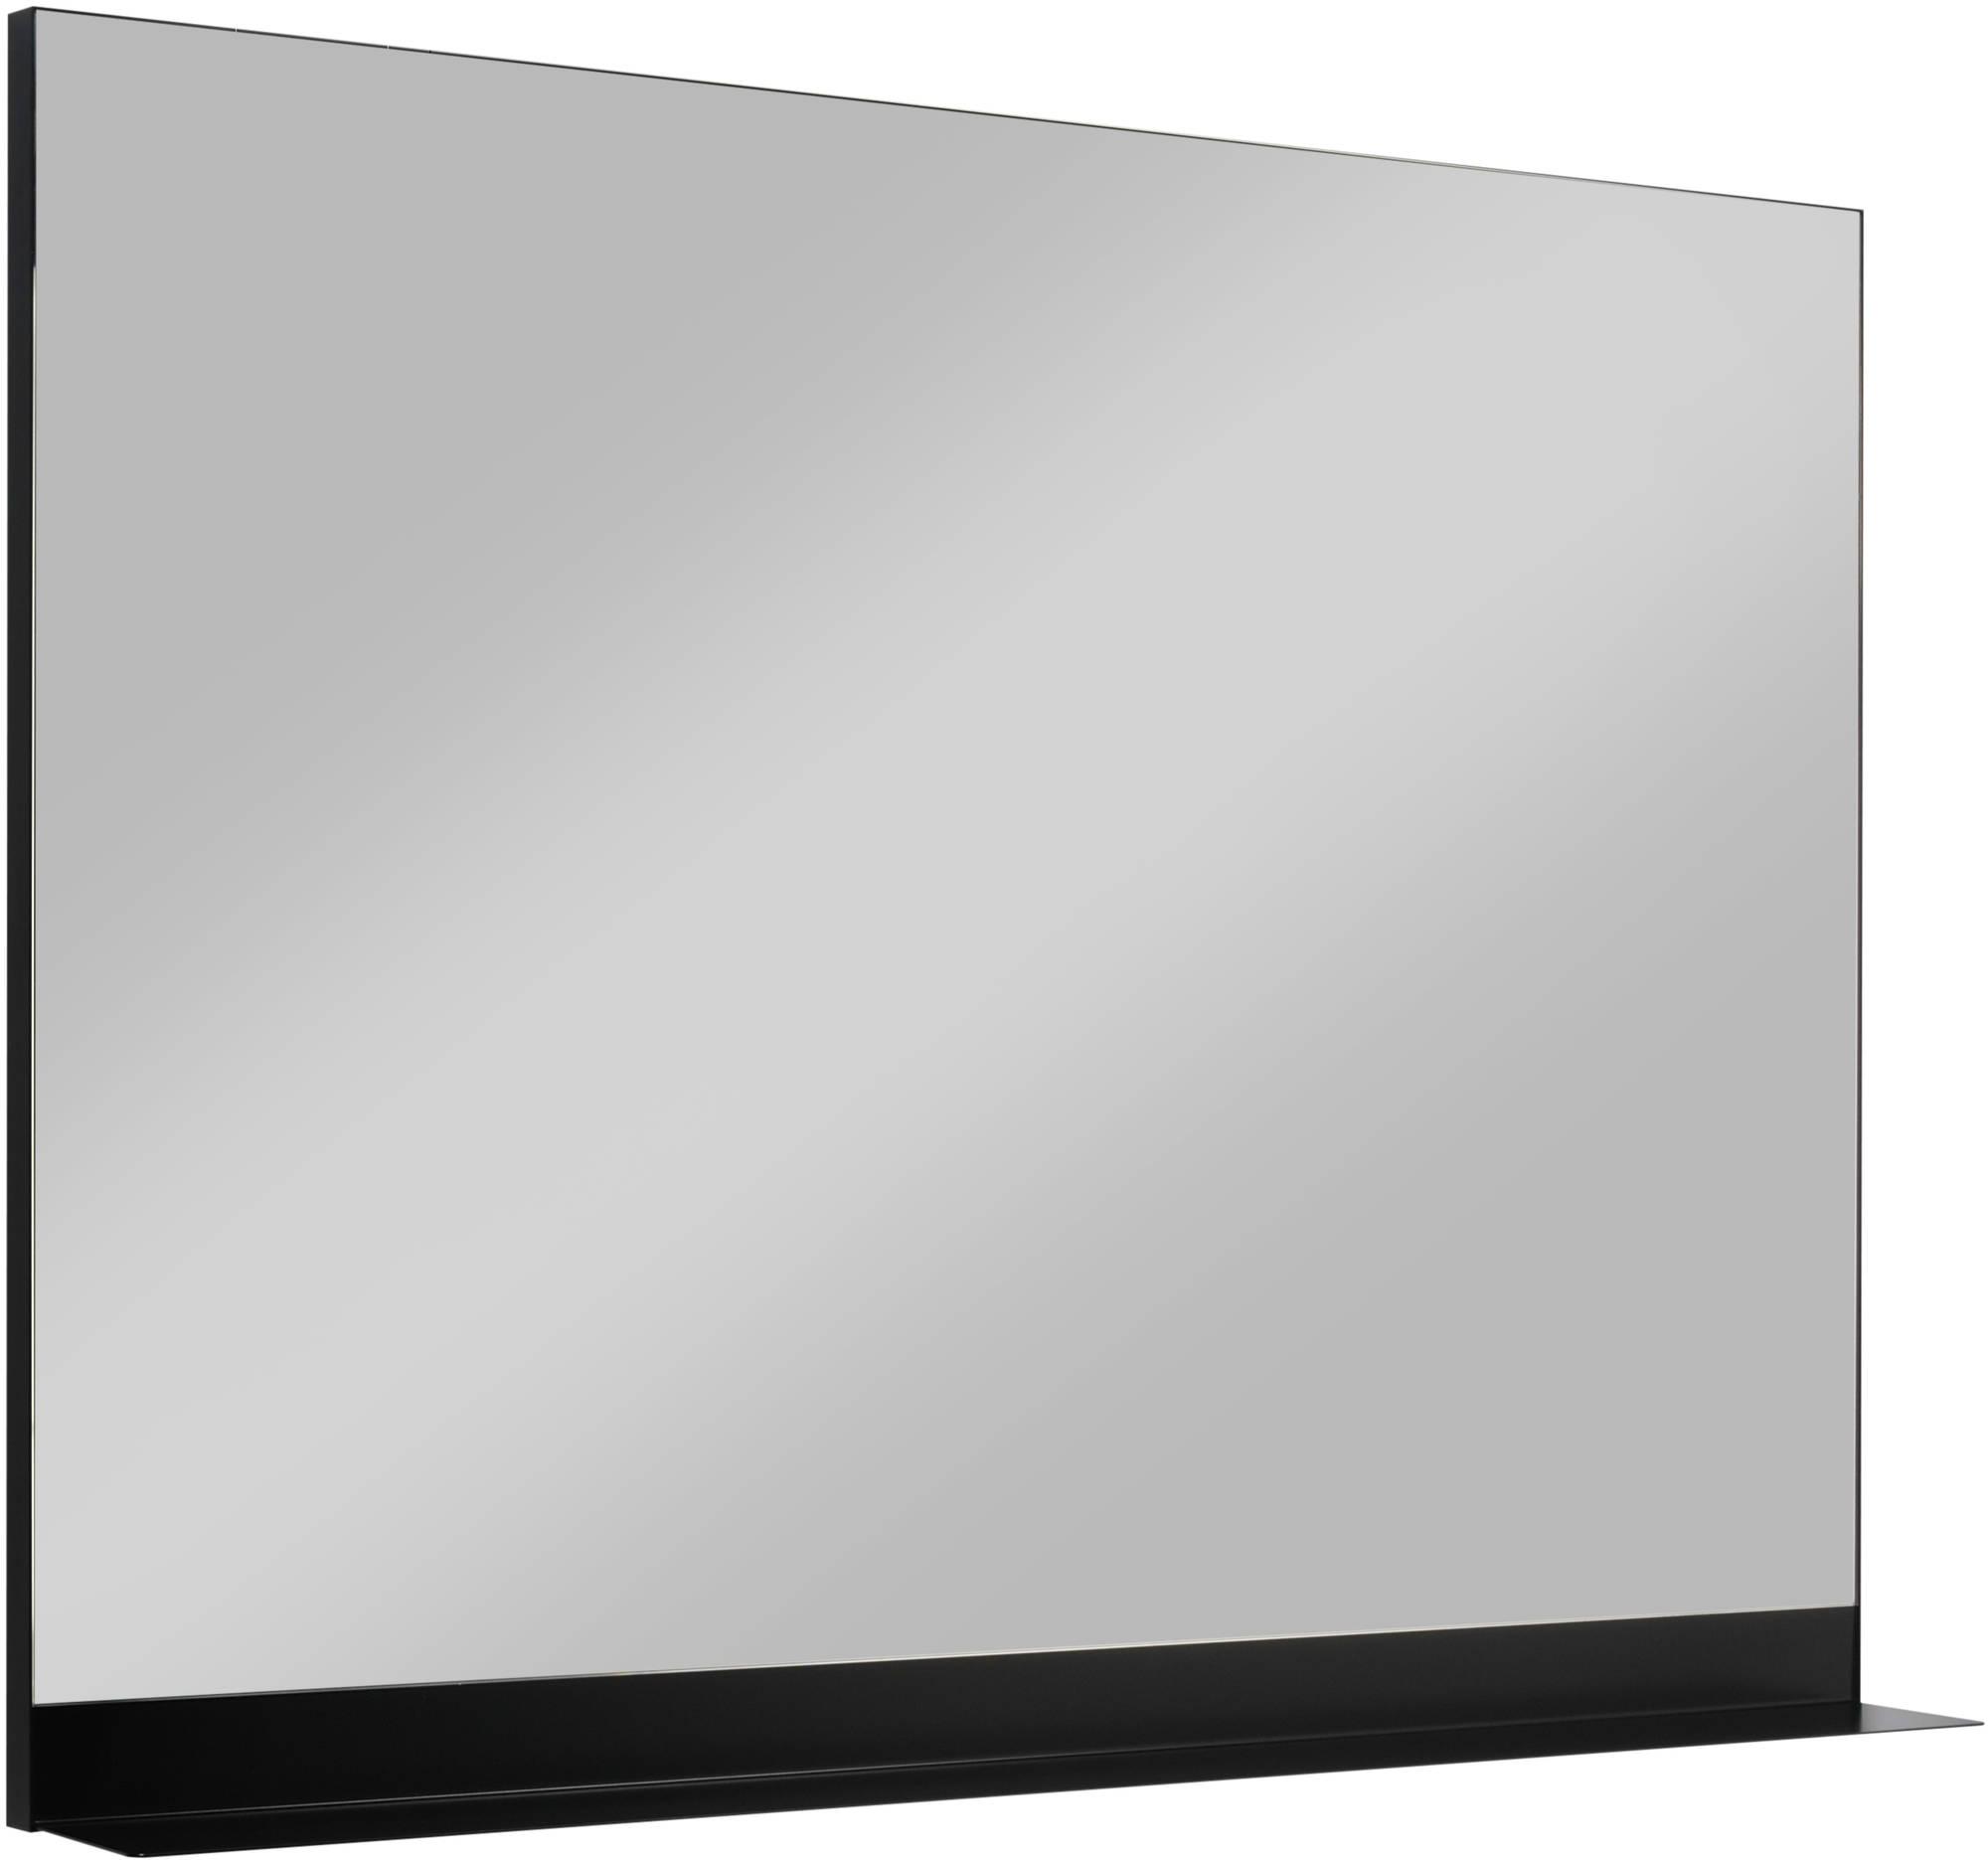 Ben Fossano spiegel met mat zwarte planchet 120x75cm